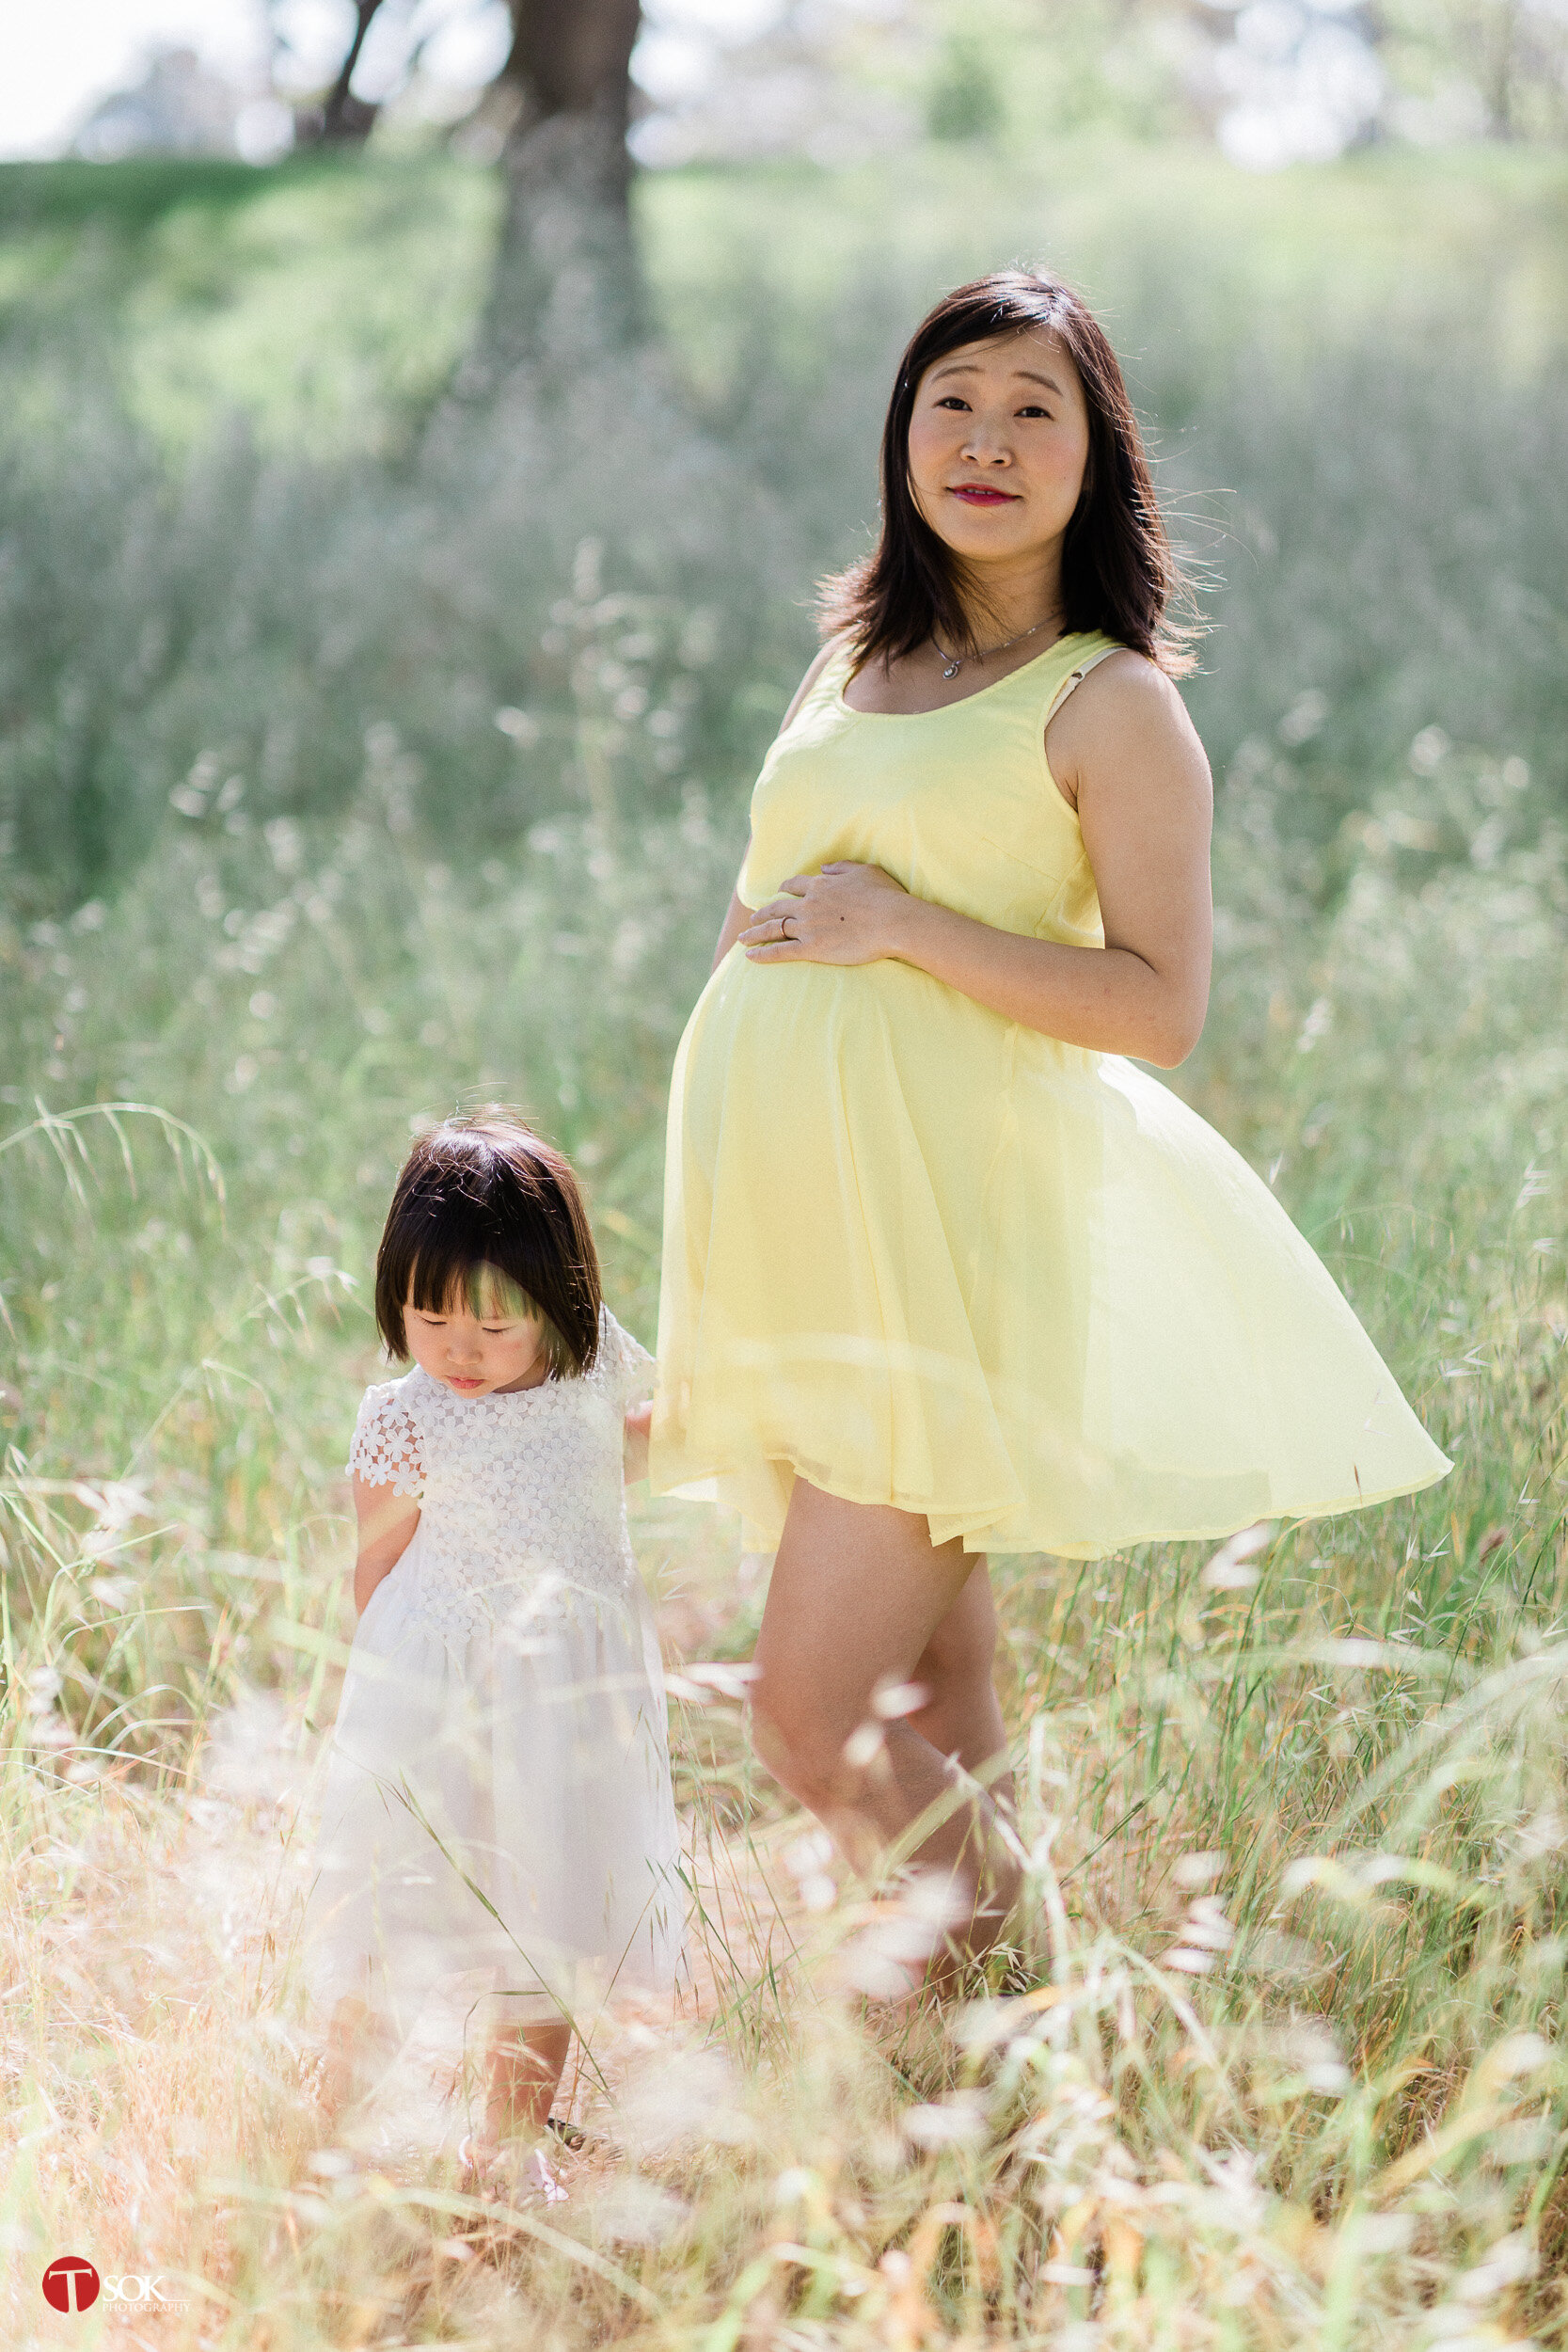 20190504_0007_yuen_maternity_baylands_park.jpg